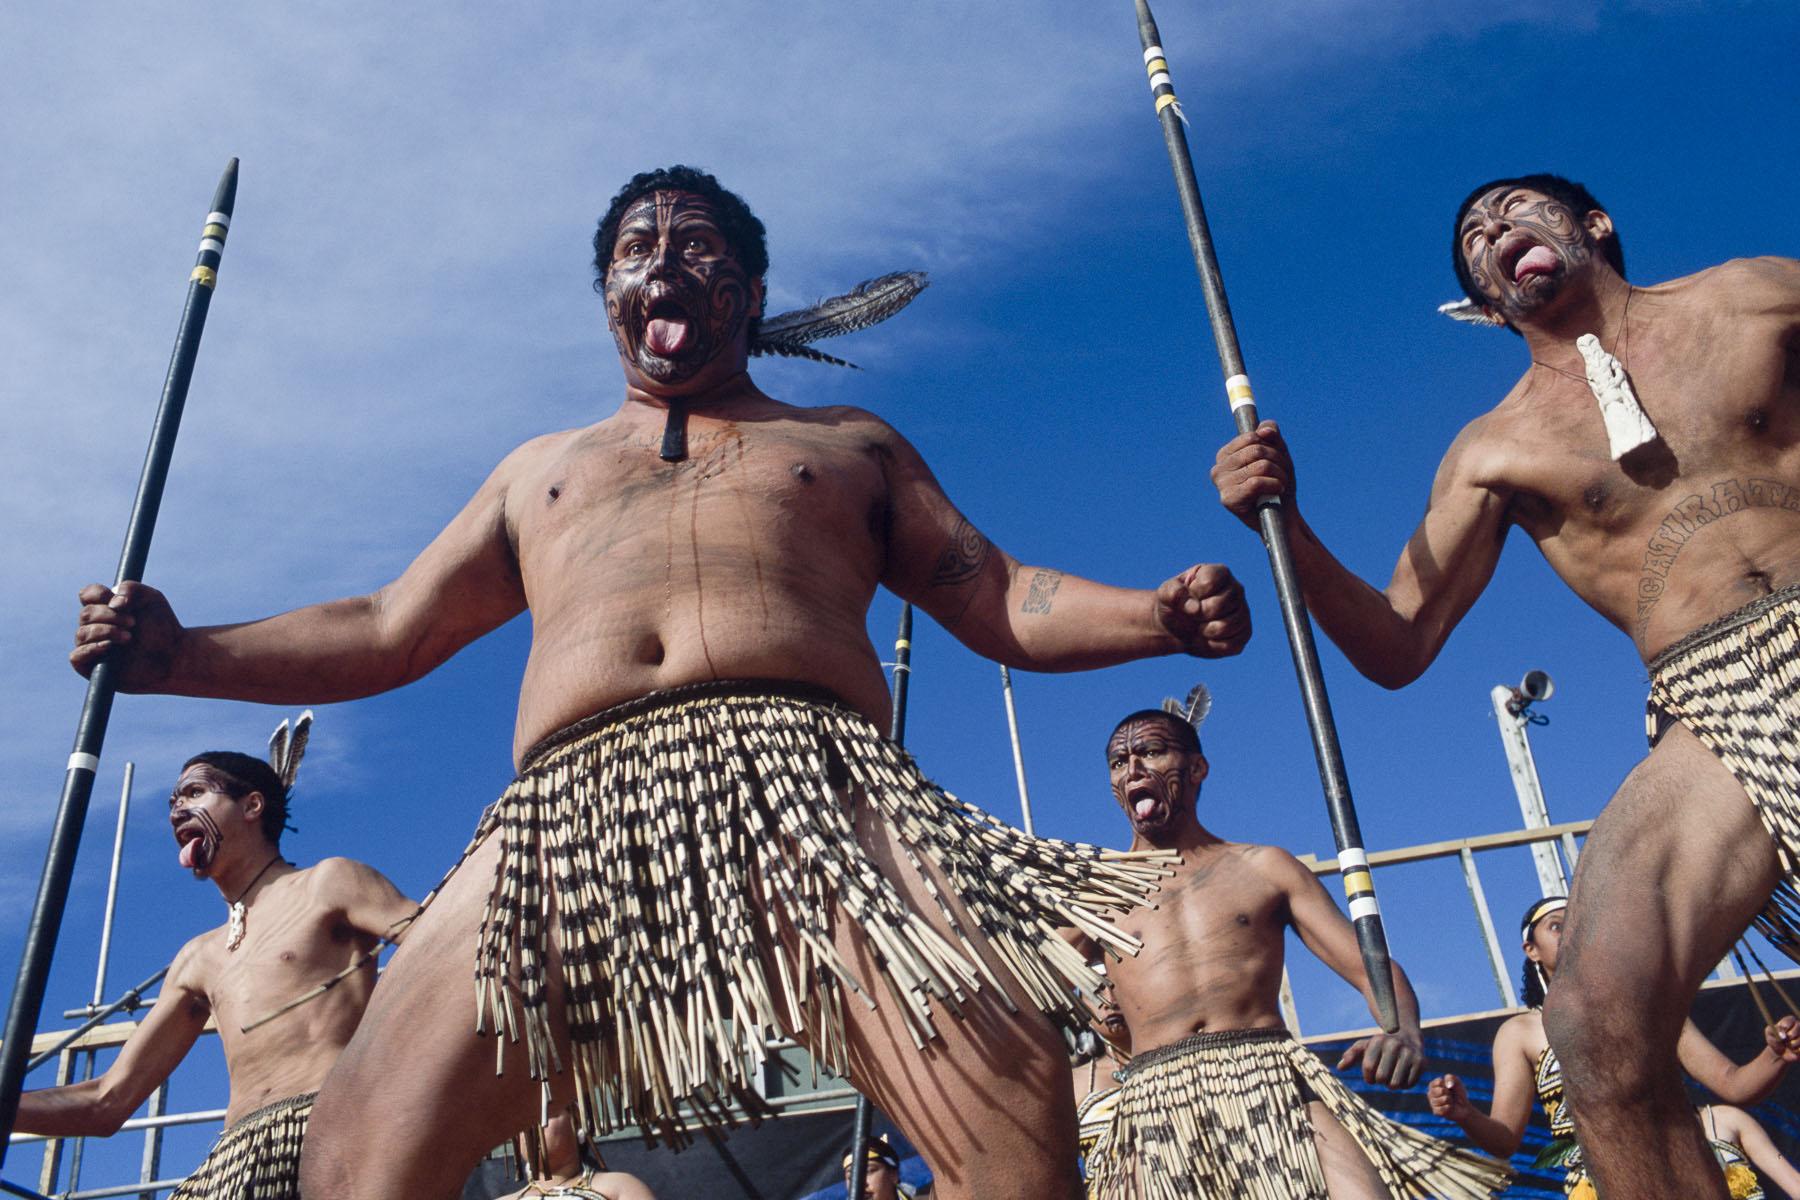 Maoris men perform a haka during a culture folk arts festival in May 2000